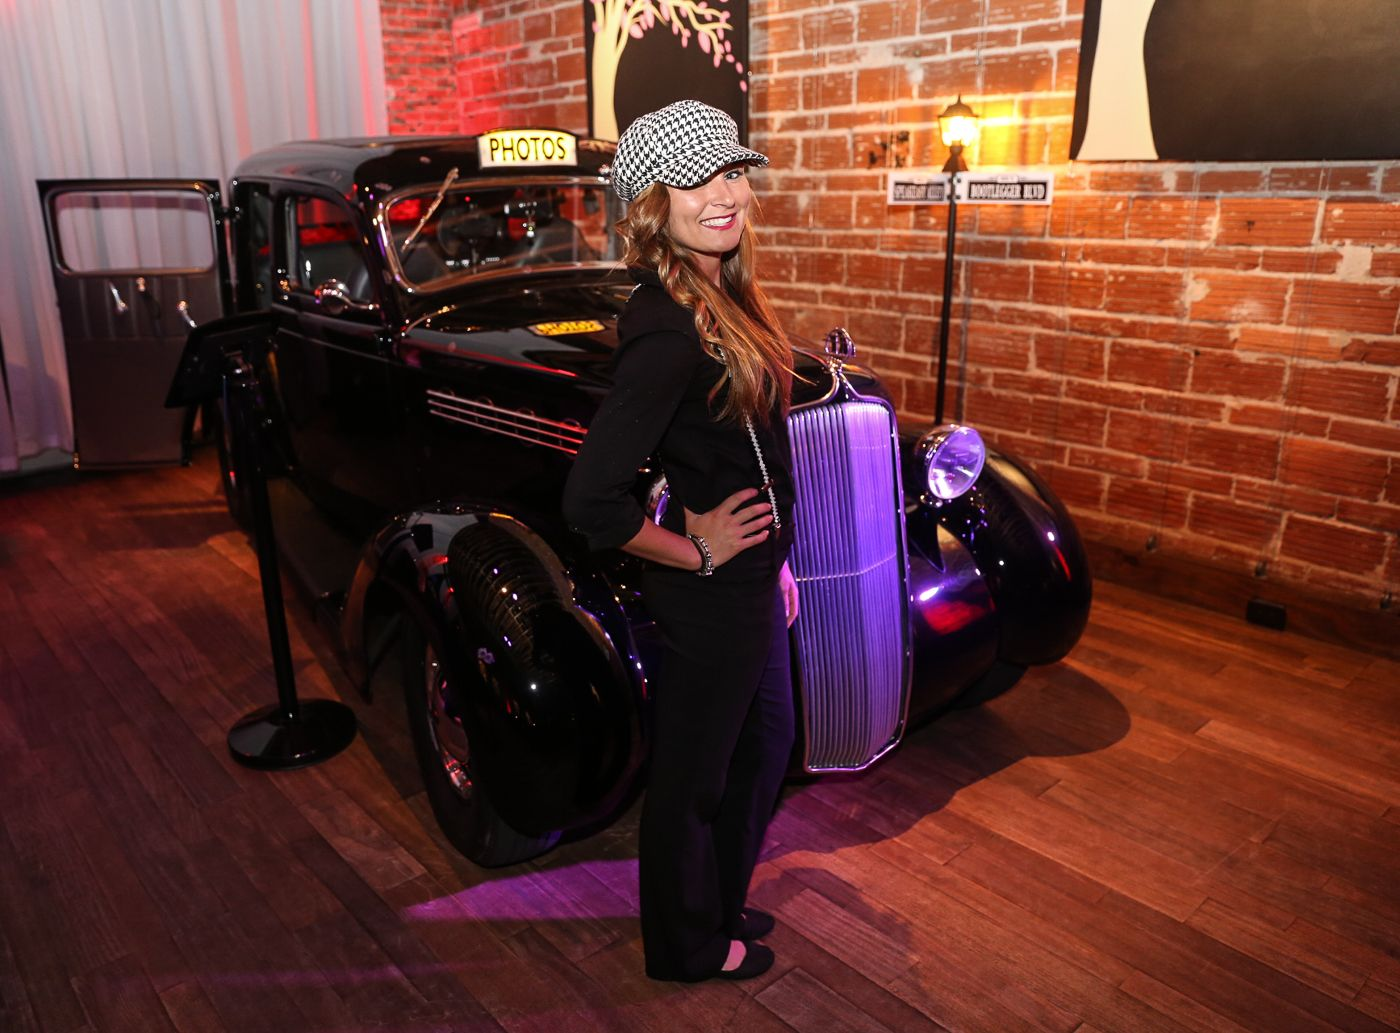 2015 11-28 Olsen-20th-Anniversary-Party-at-venue-NOVA-535-downtown-StPete-DTSP-55